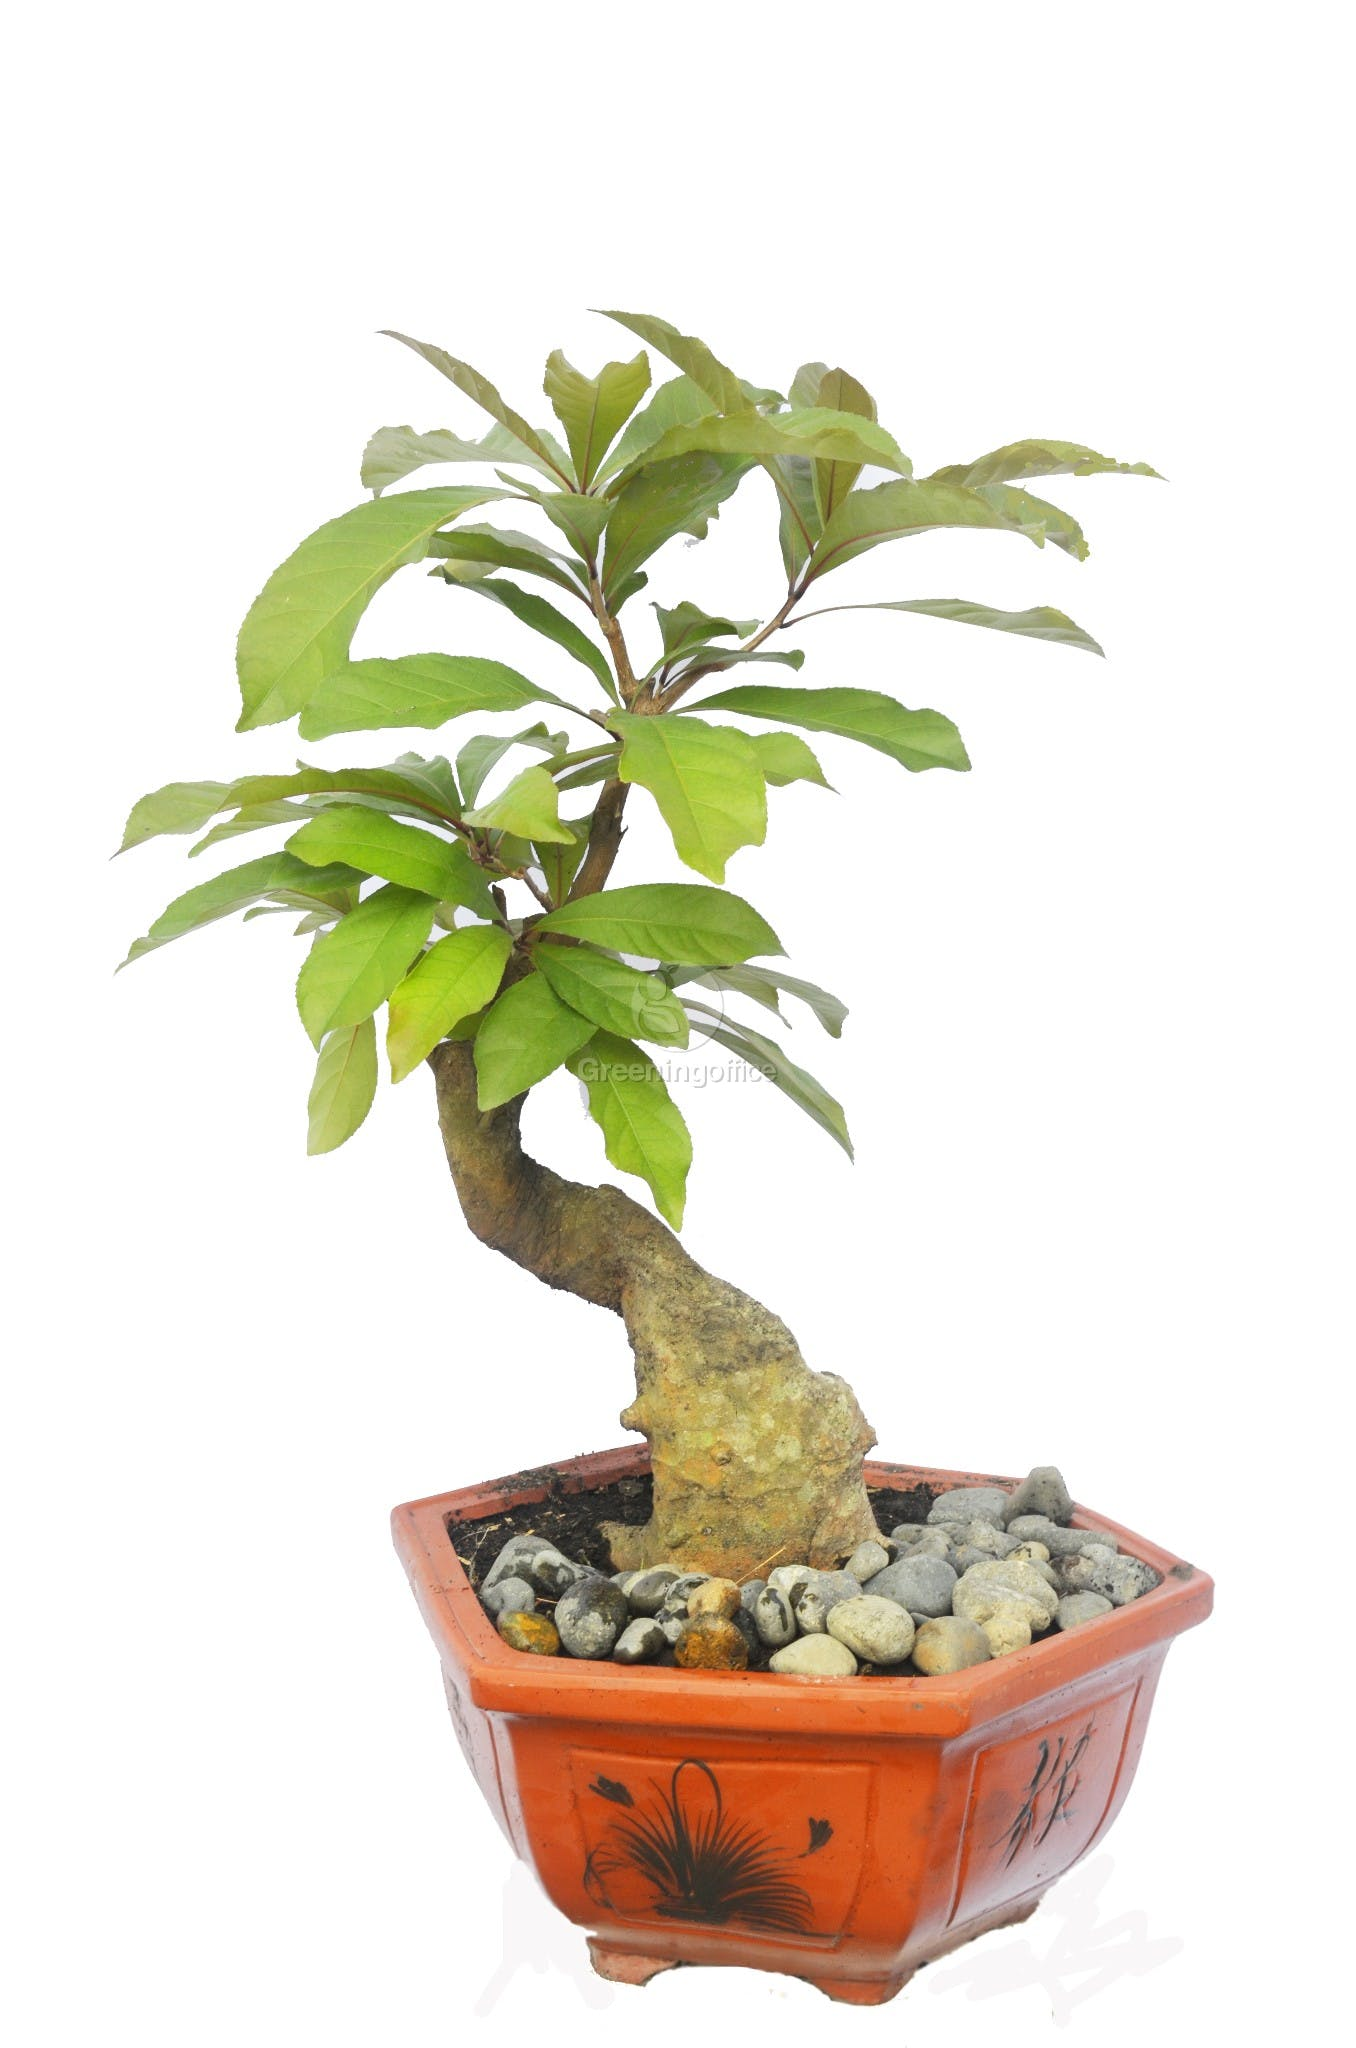 Chậu bonsai mini đẹp